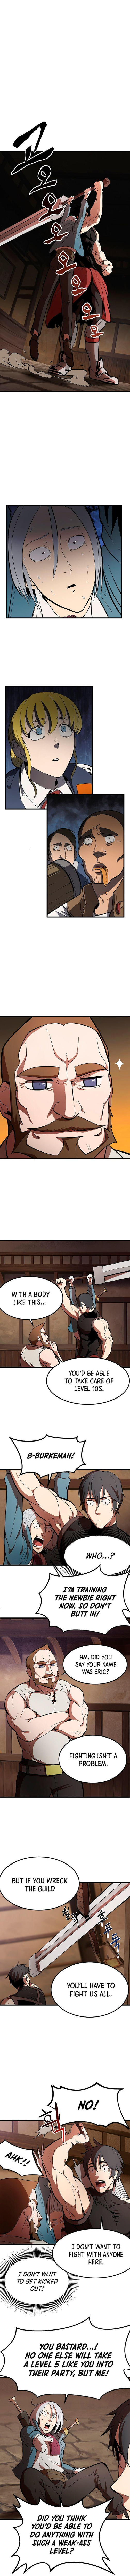 Survival Story Of A Sword King In A Fantasy World Chapter 6 page 2 - Mangakakalots.com